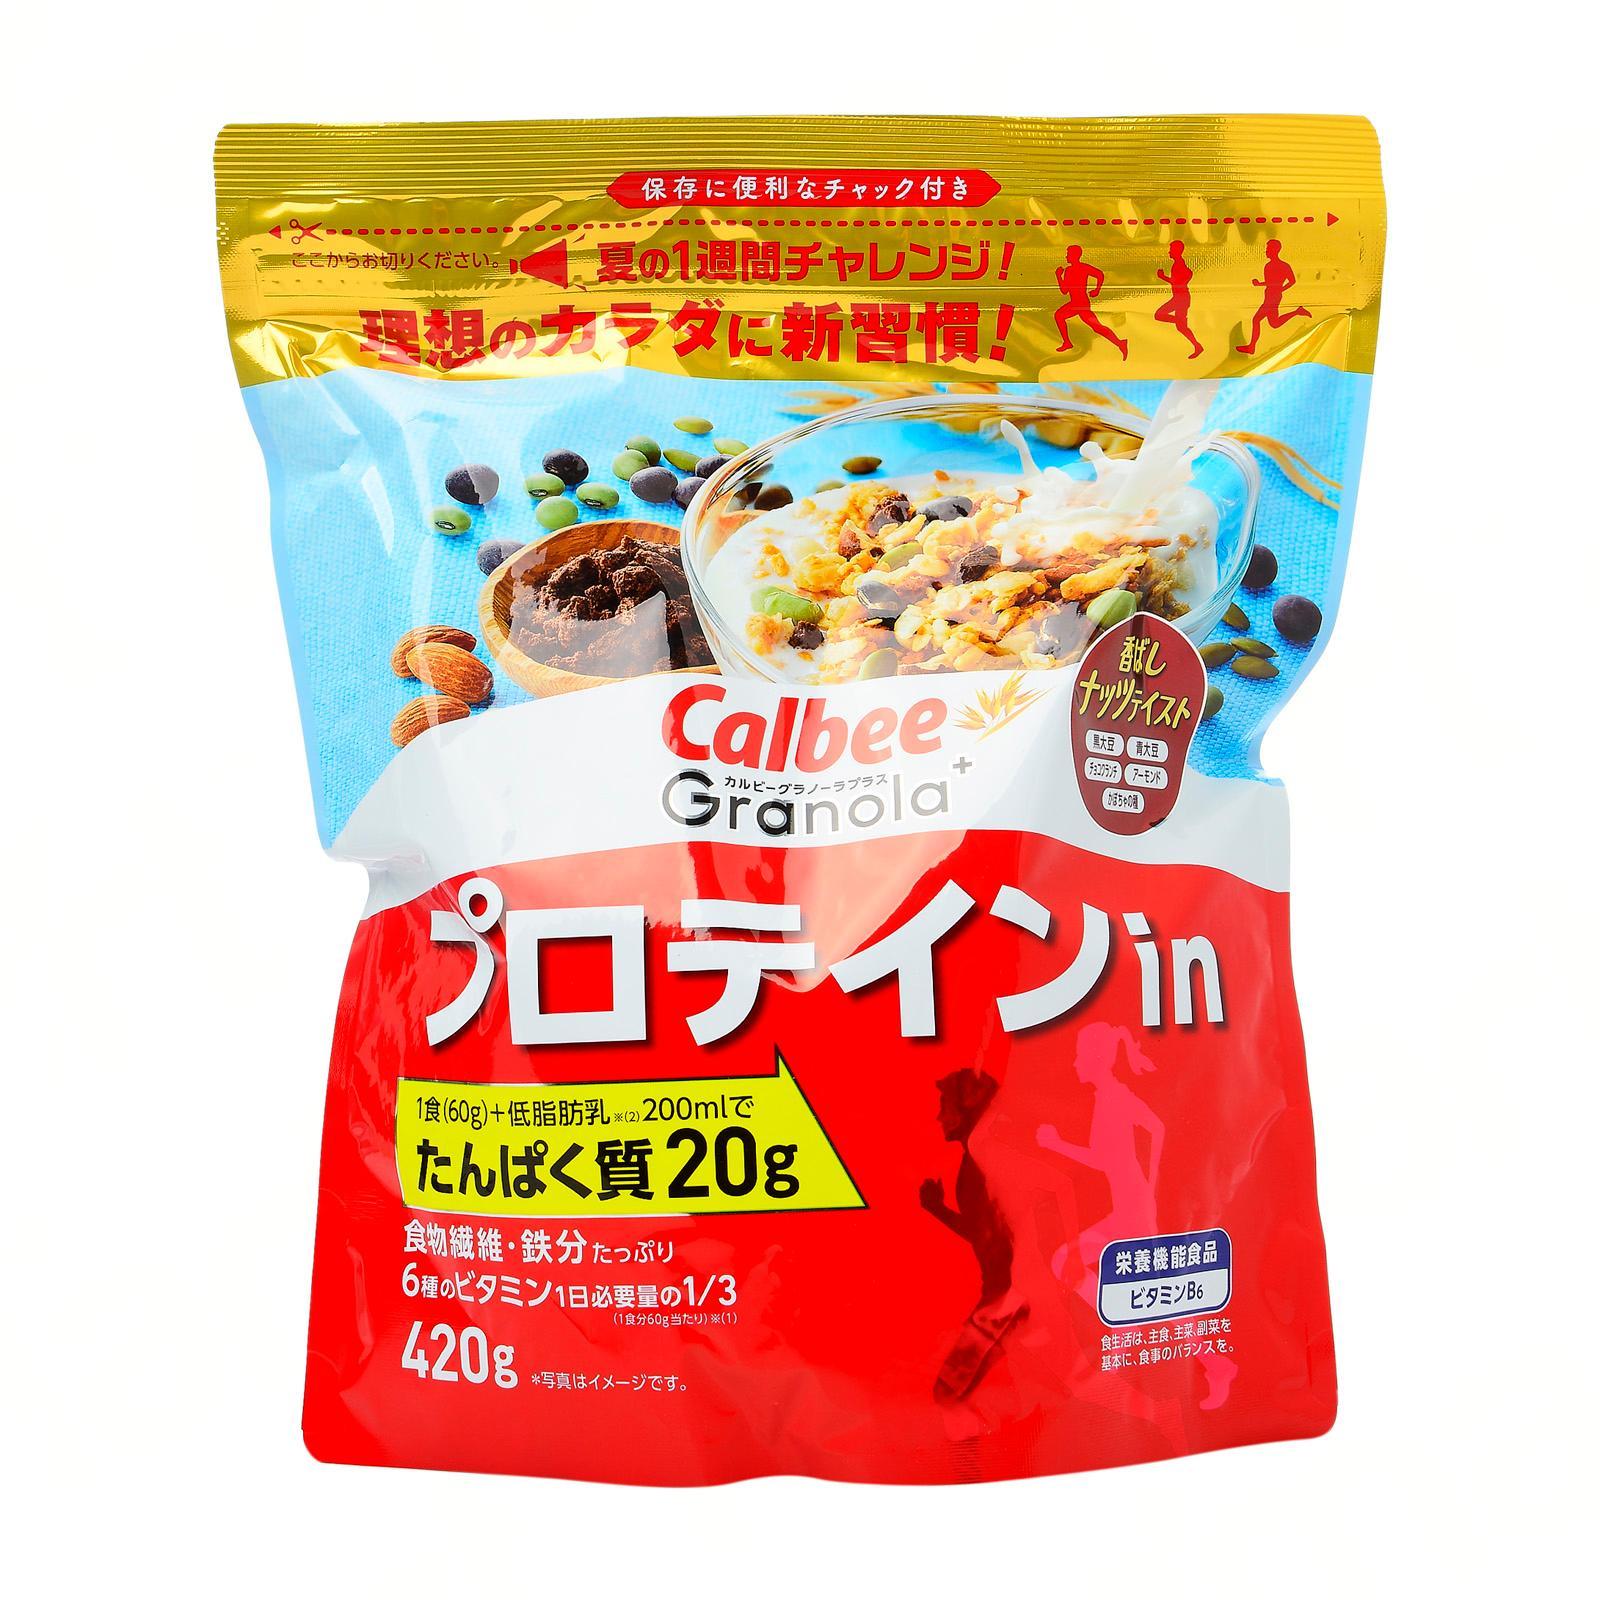 Calbee Plus Protein In Granola